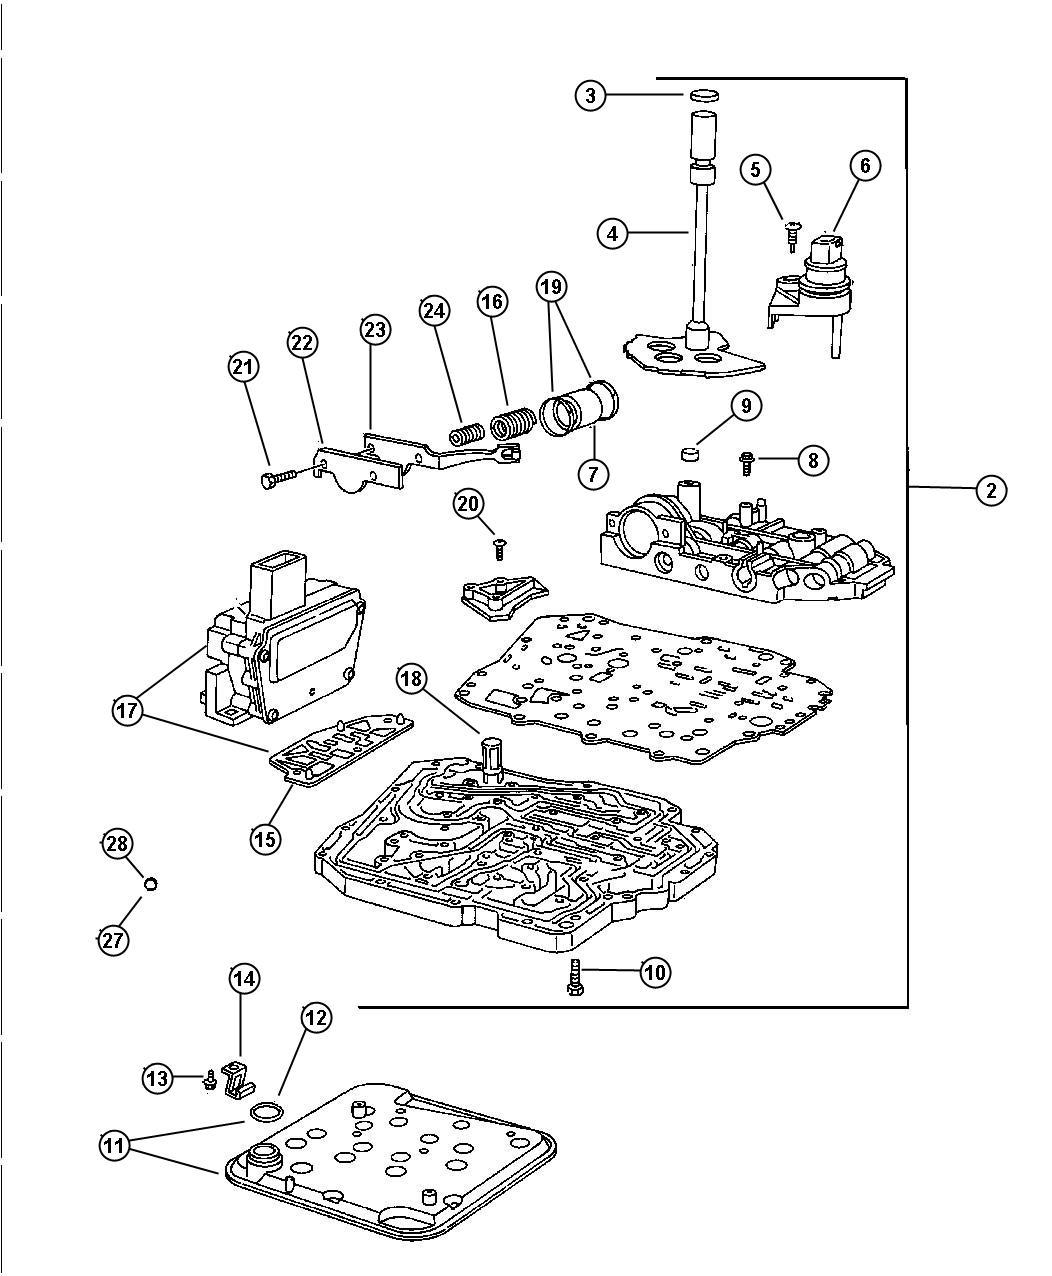 hight resolution of dodge intrepid transmission wiring diagram get free 97 dodge intrepid vacuum schematic dodge intrepid cruise control